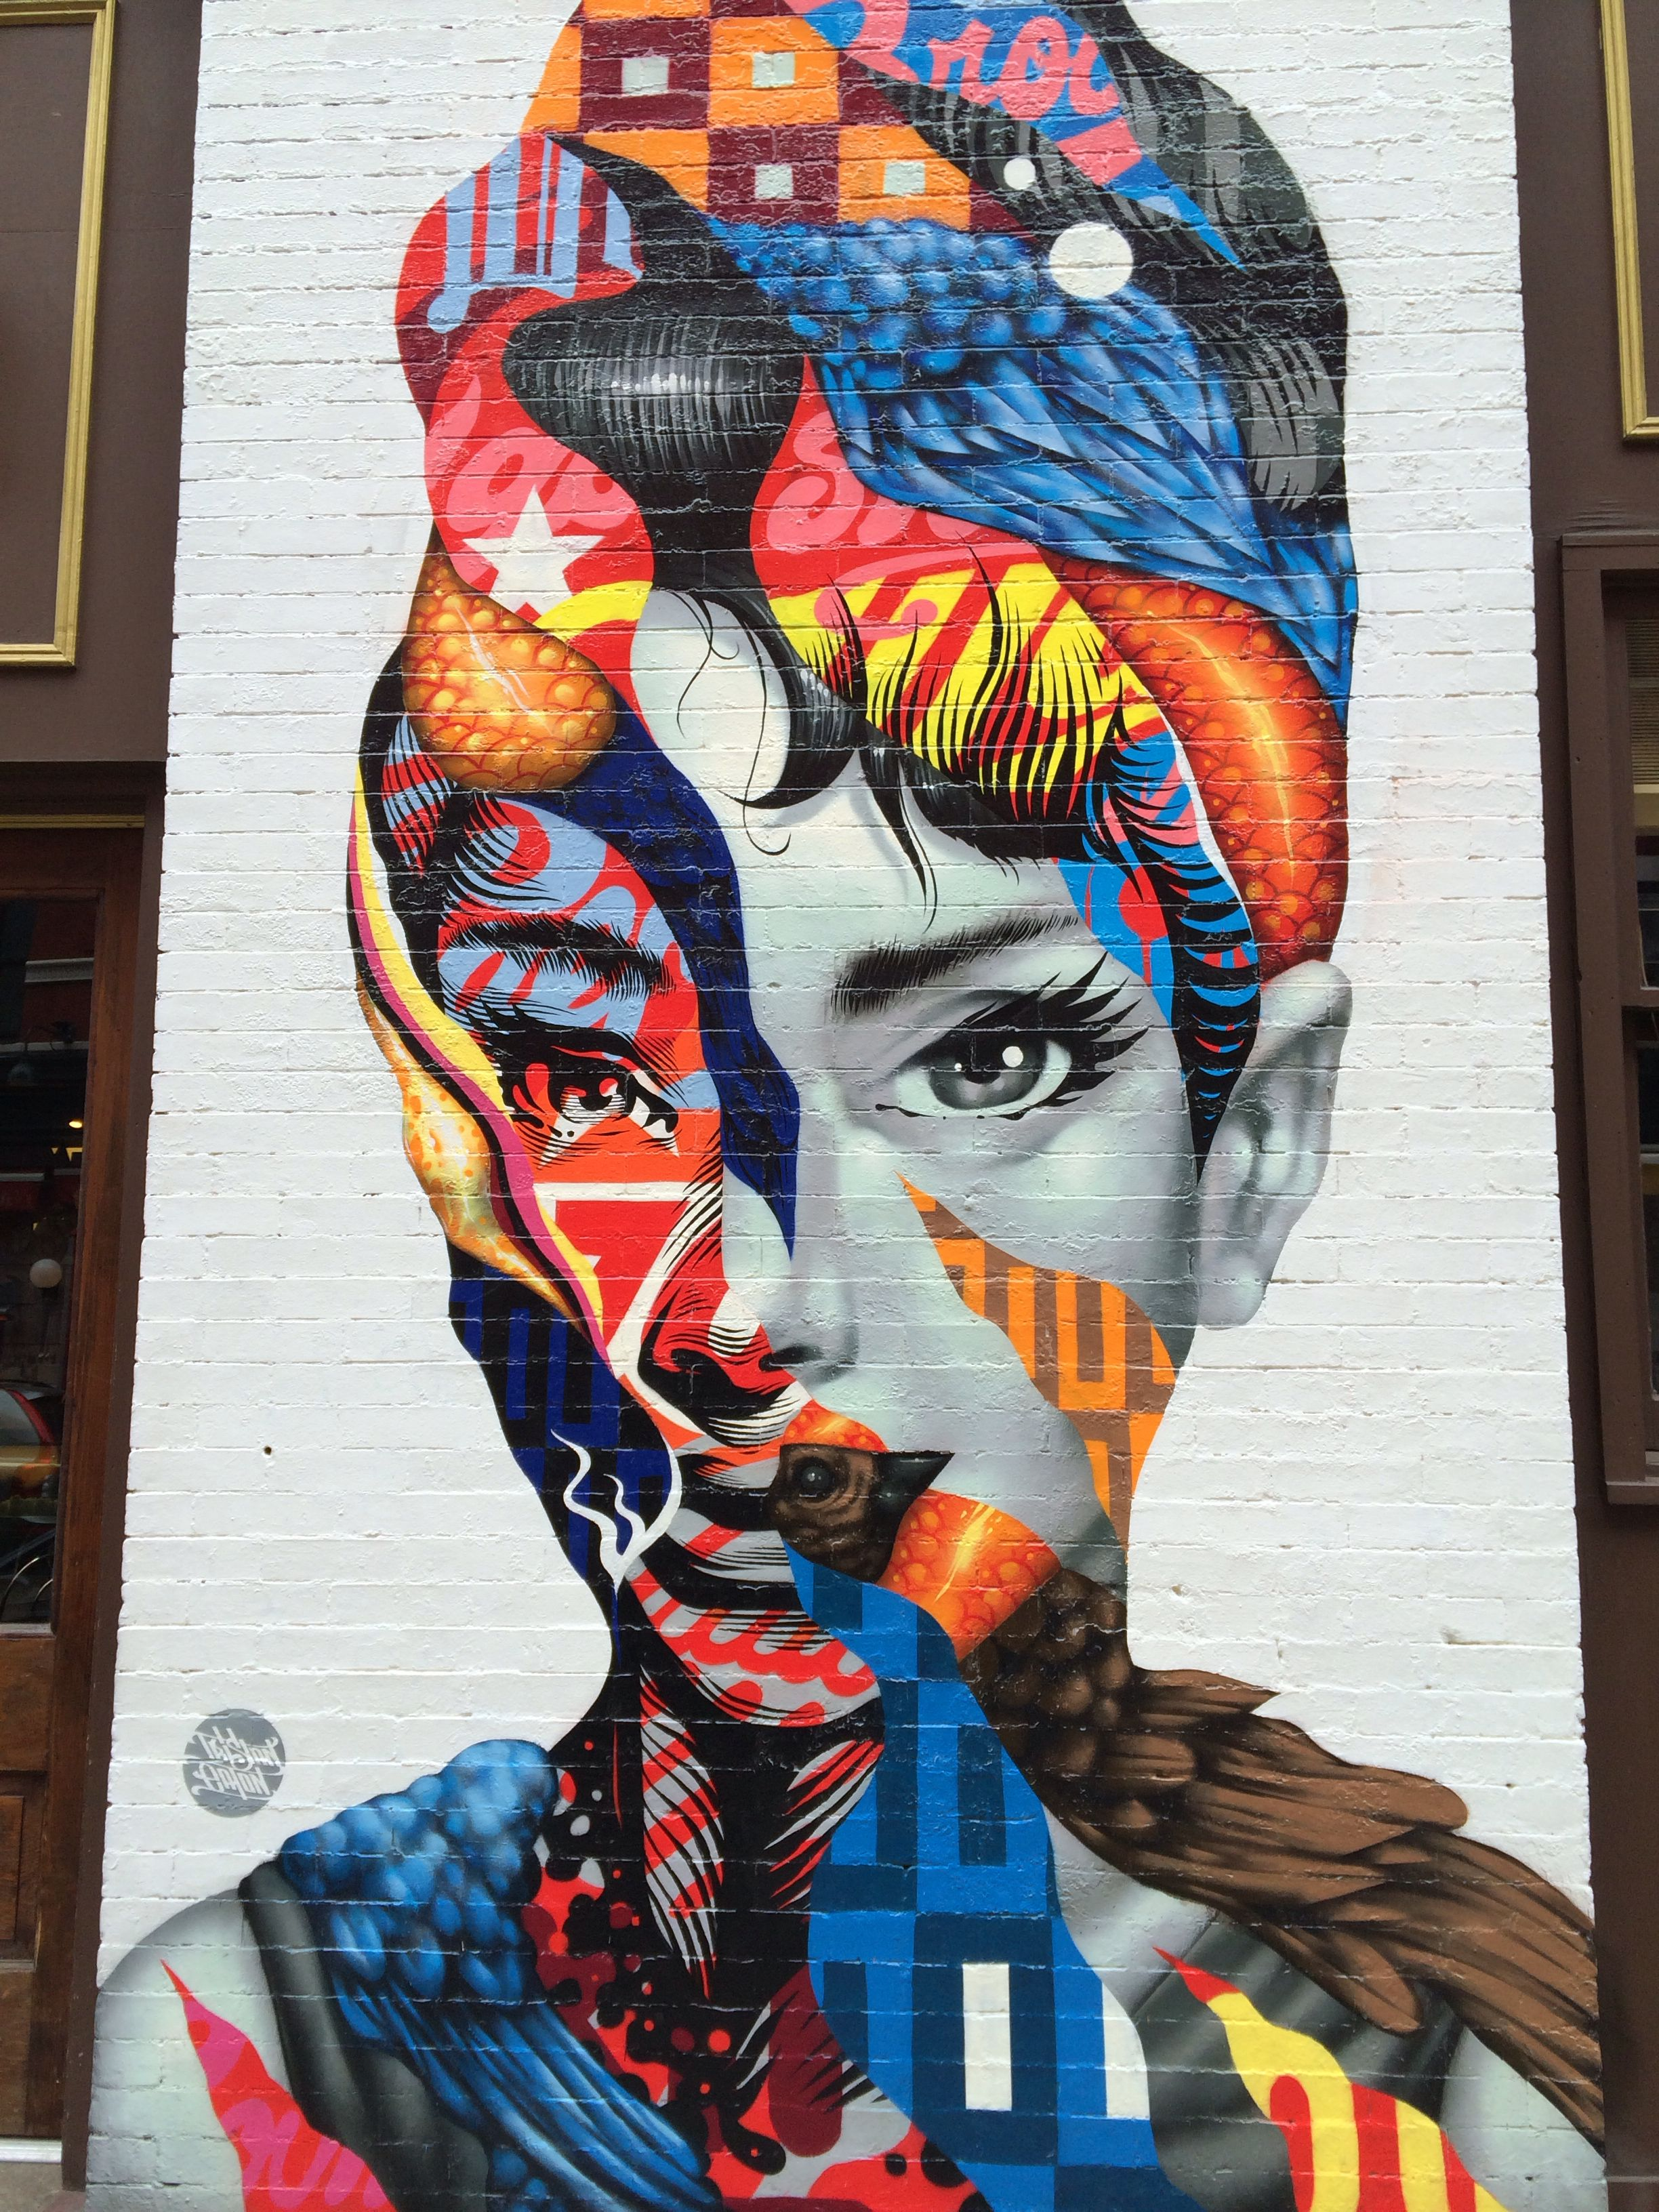 A0 SUPER SIZE CANVAS STREET ART GRAFFITI  PRINT  BANKSY new york painting